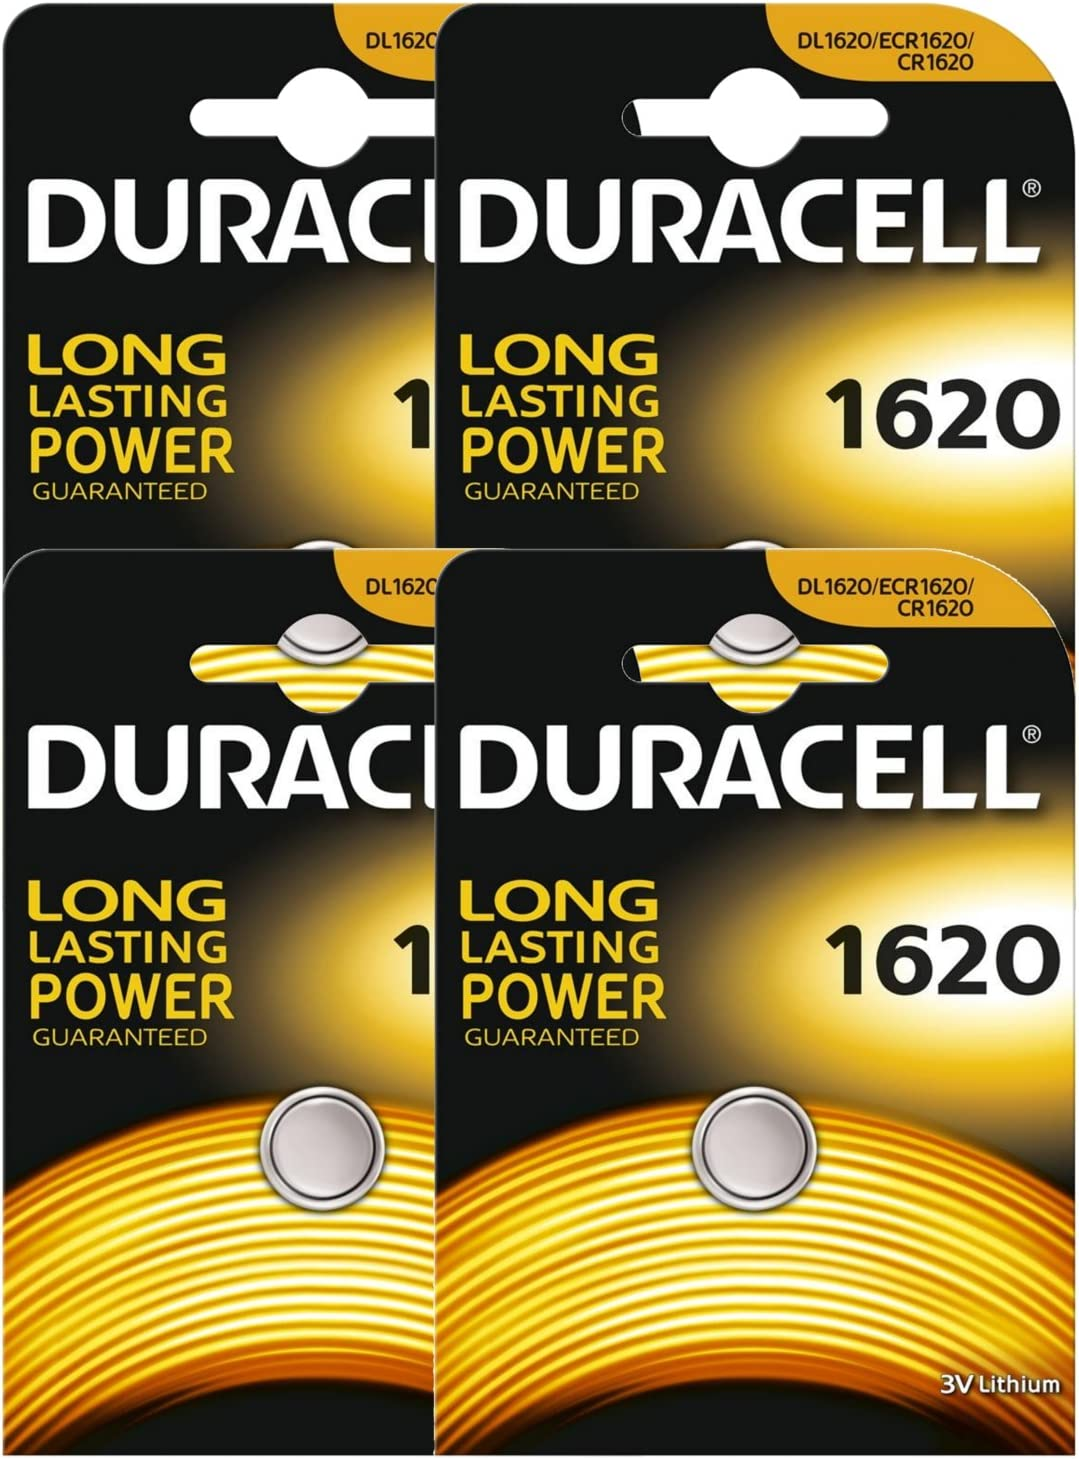 4 X Duracell Cr1620 Dl1620 Ecr1620 3v Lithium Button Elektronik